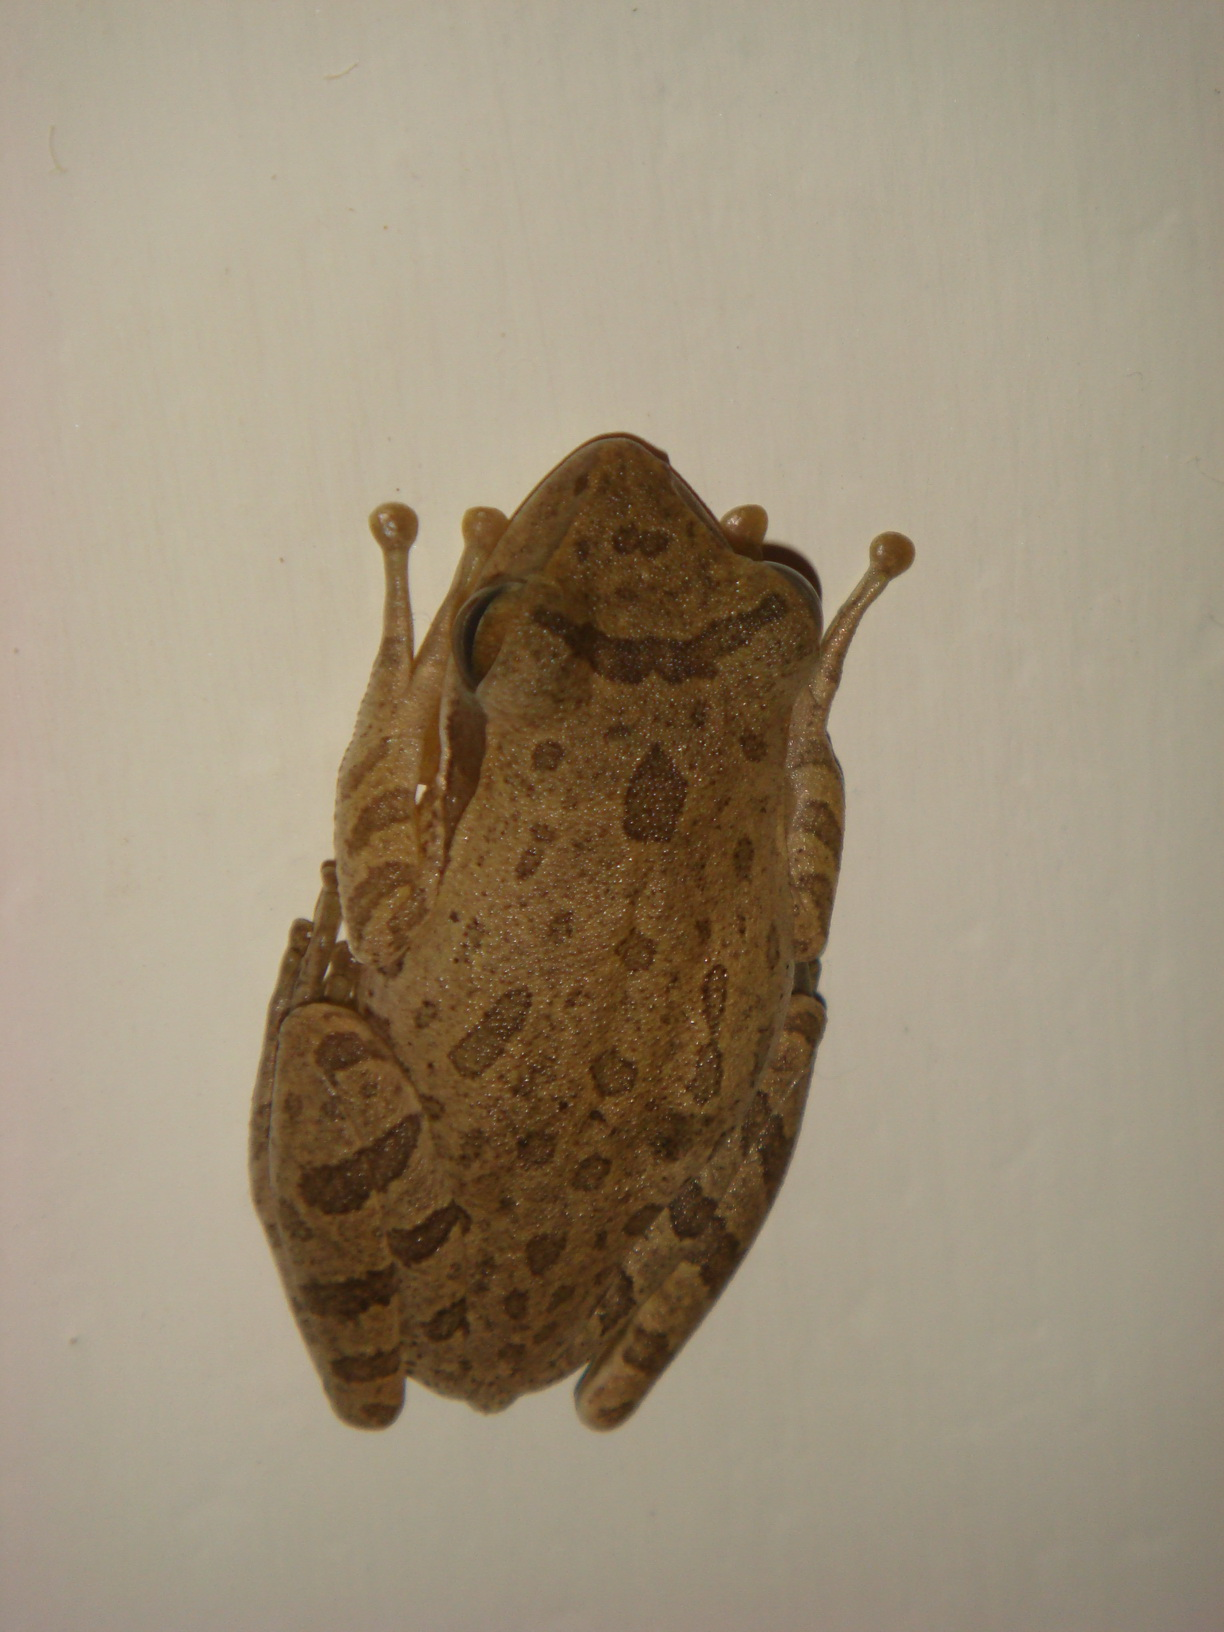 Frog hiding on plain wall